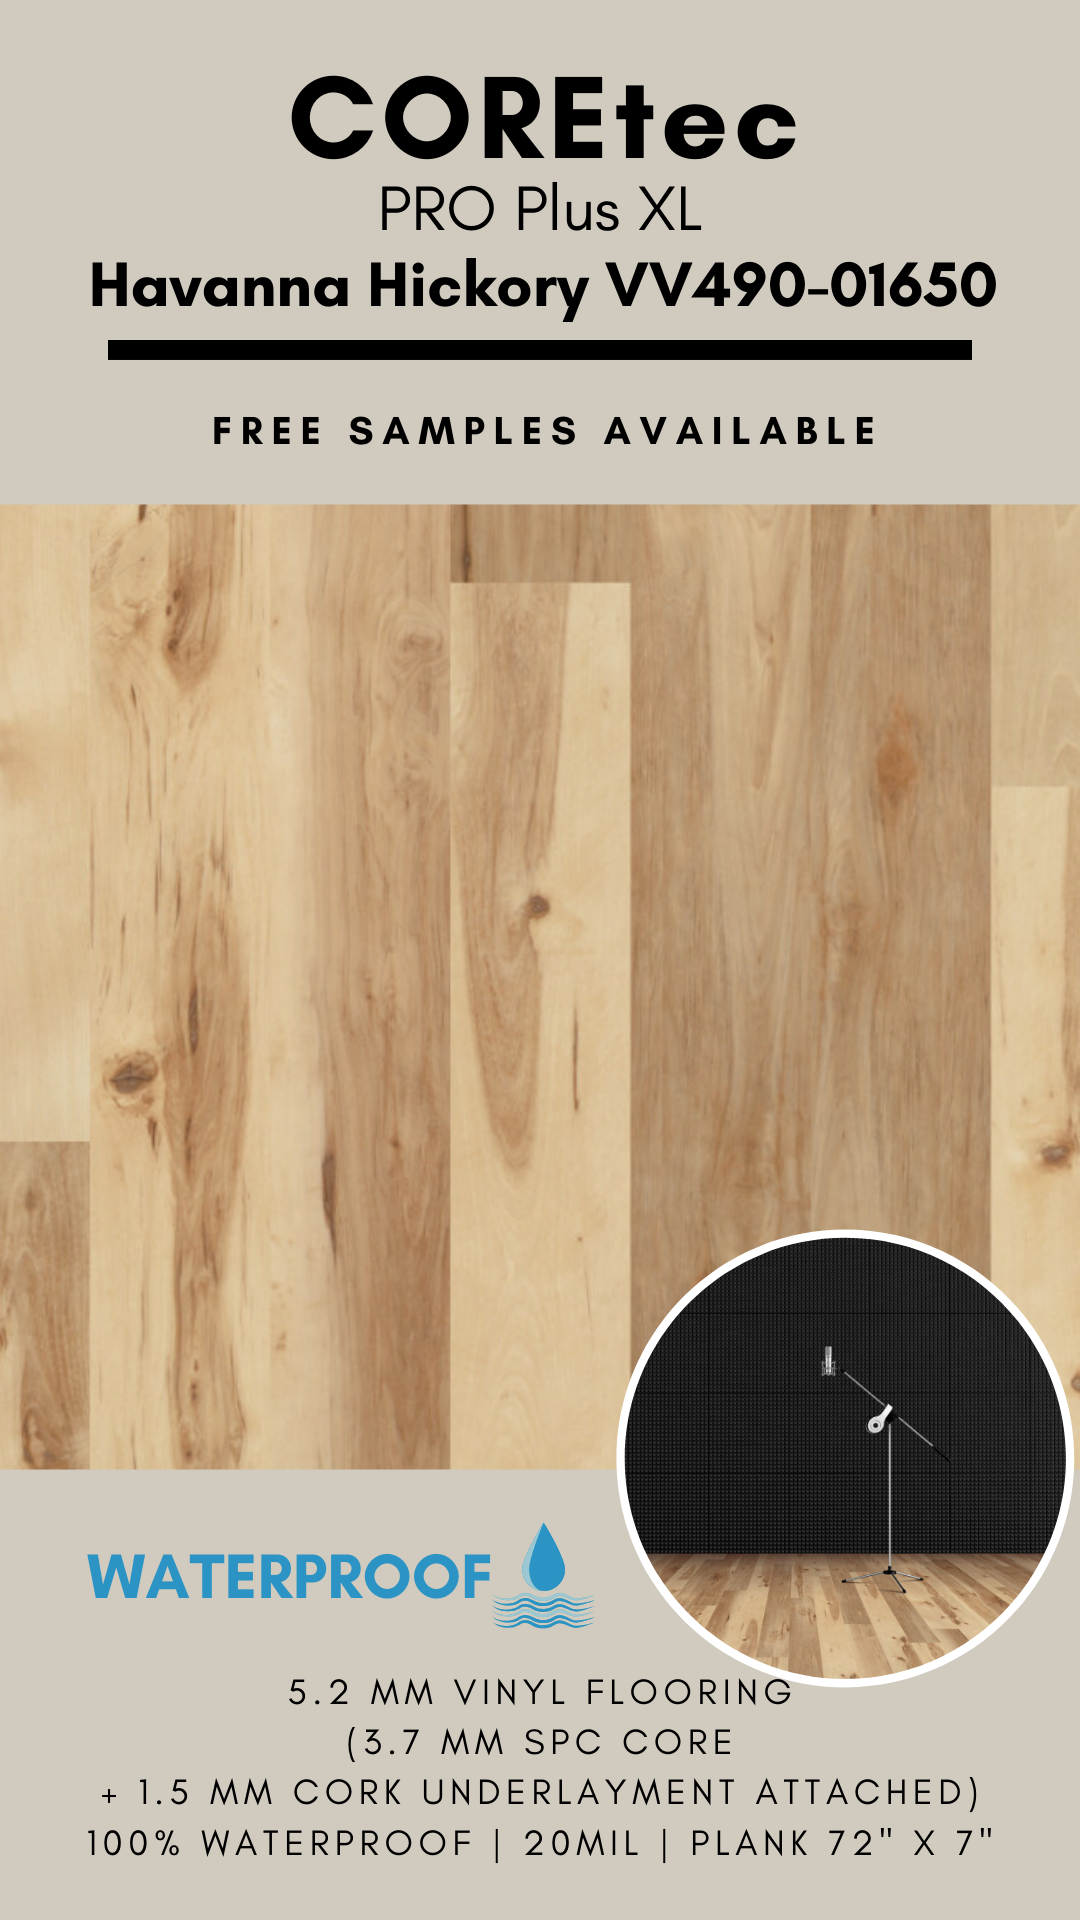 Coretec Pro Plus Xl Havanna Hickory Vv490 01650 Spc Vinyl Flooring In 2020 Vinyl Flooring Cork Underlayment Flooring